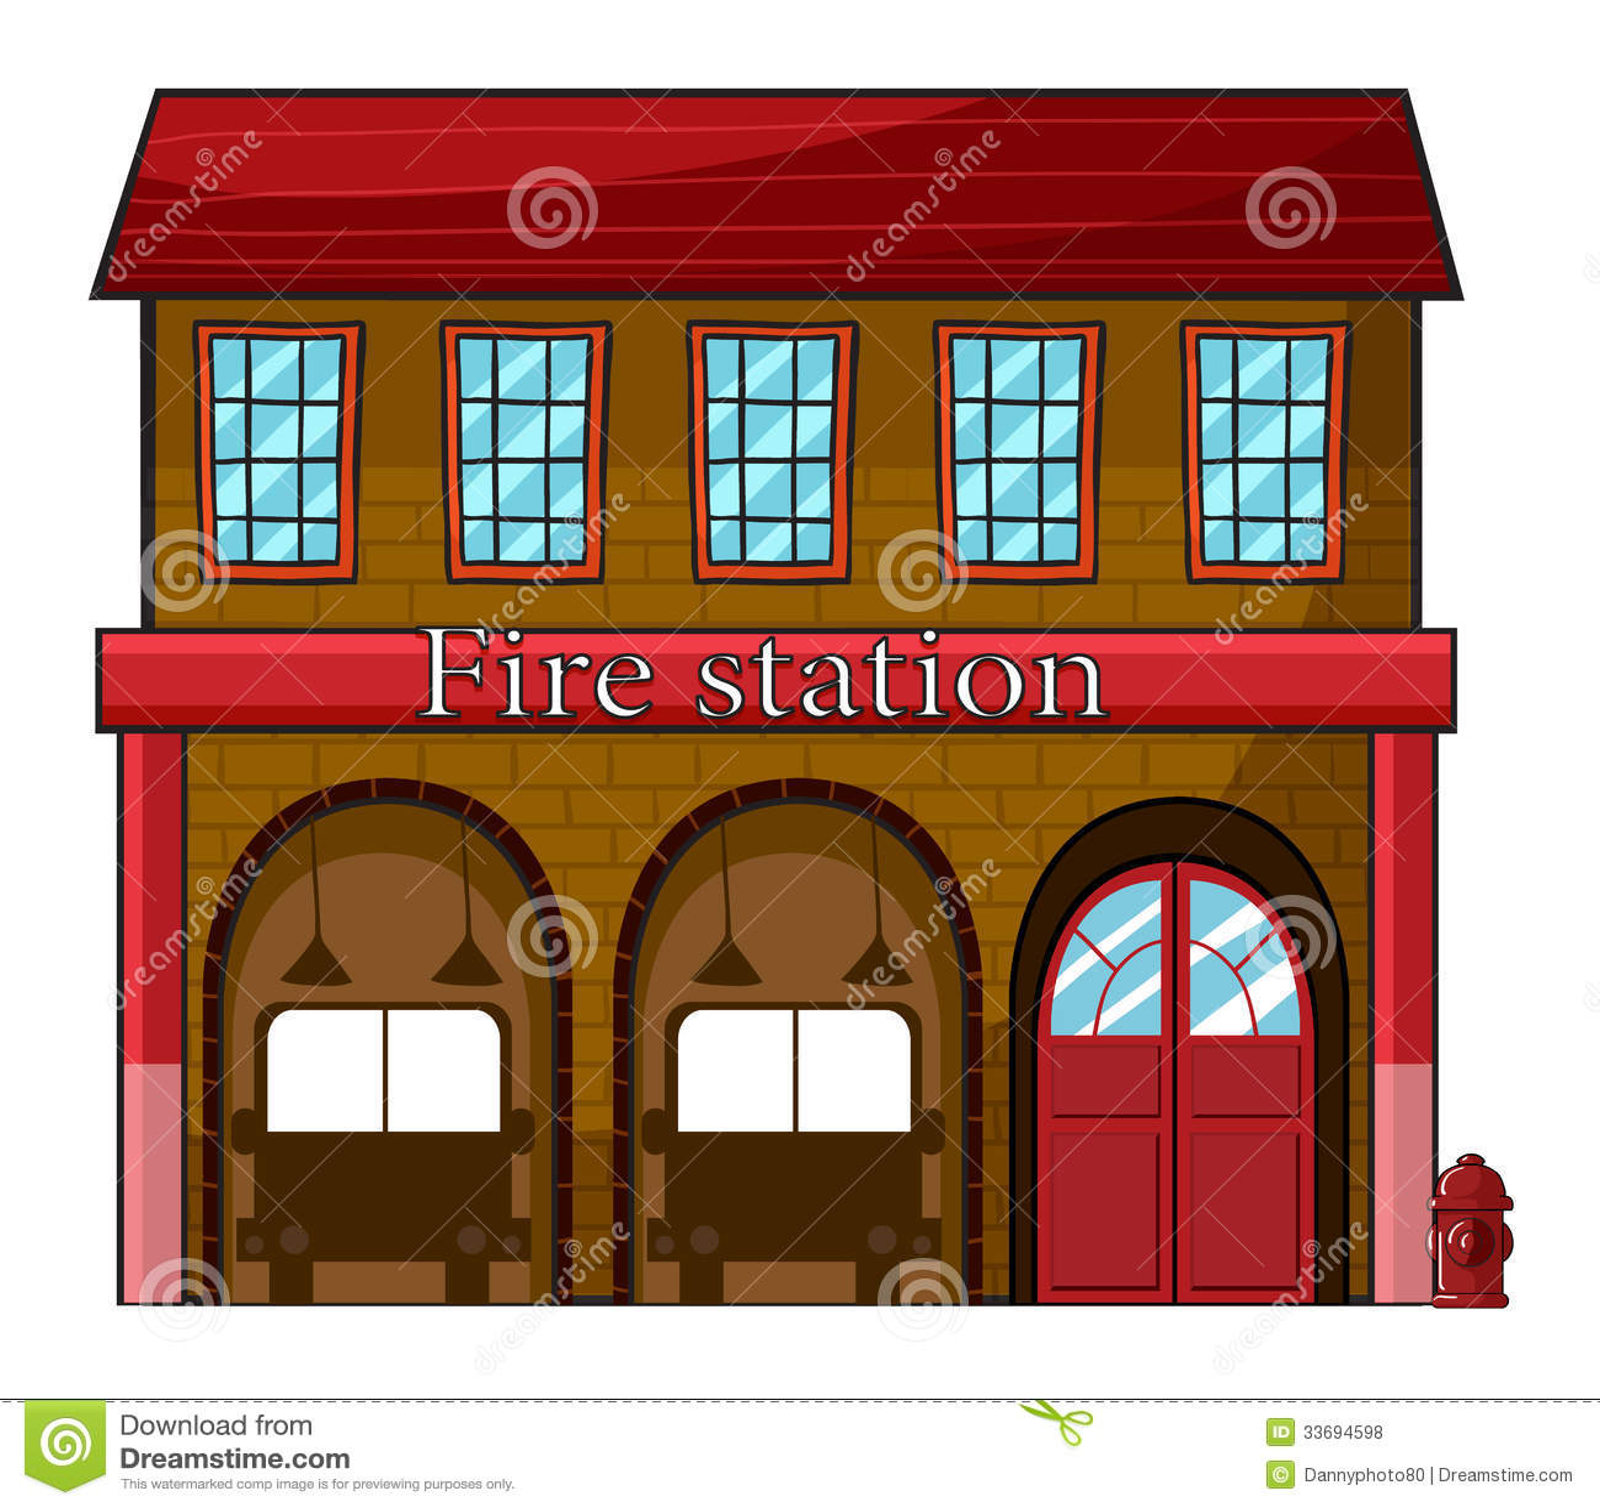 a fire station stock illustration illustration of firehouse dog clipart Fire Station Clip Art